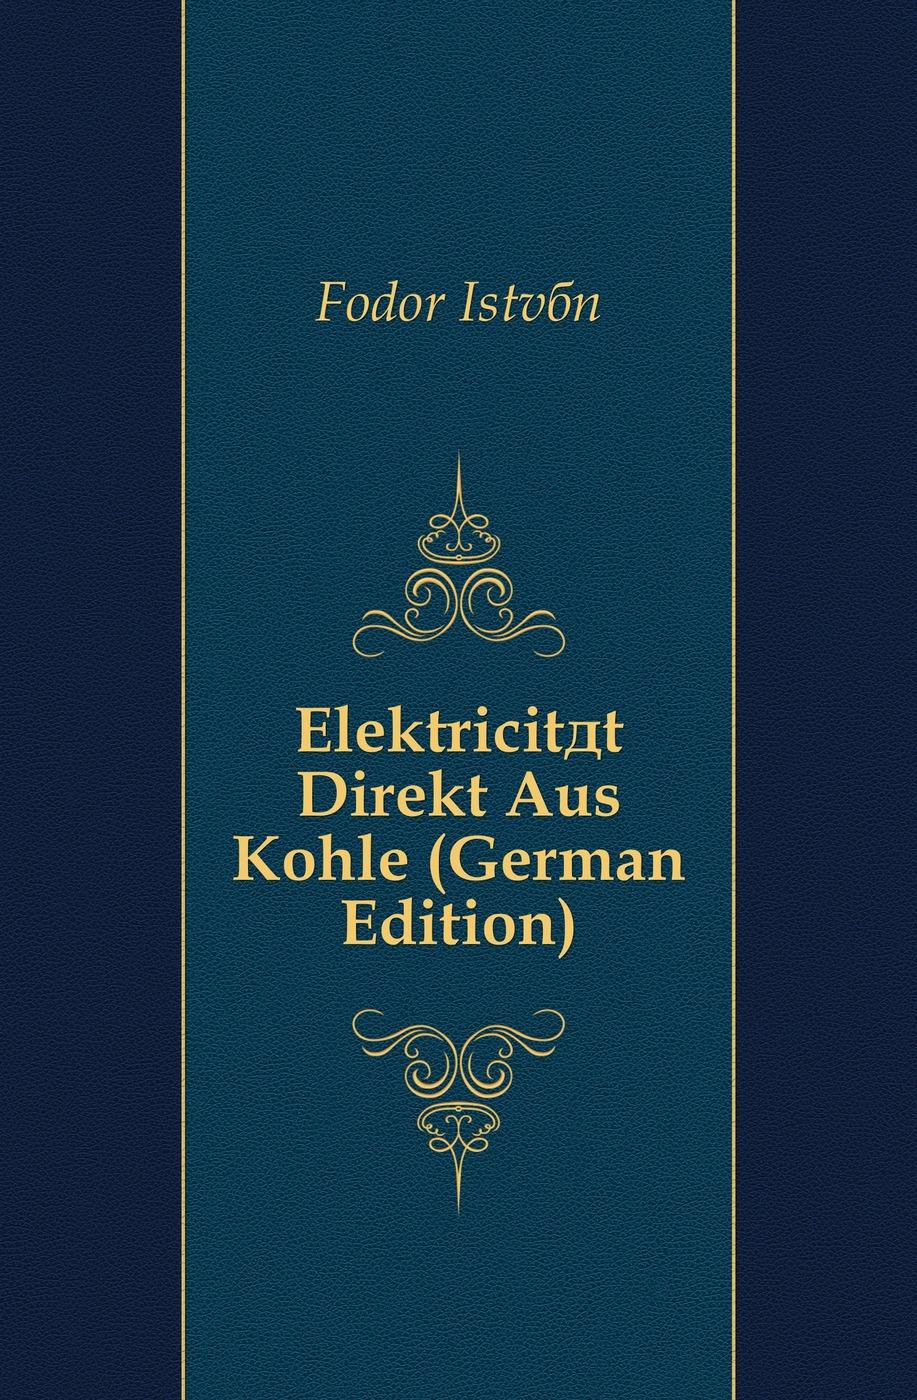 Fodor István Elektricitat Direkt Aus Kohle (German Edition)